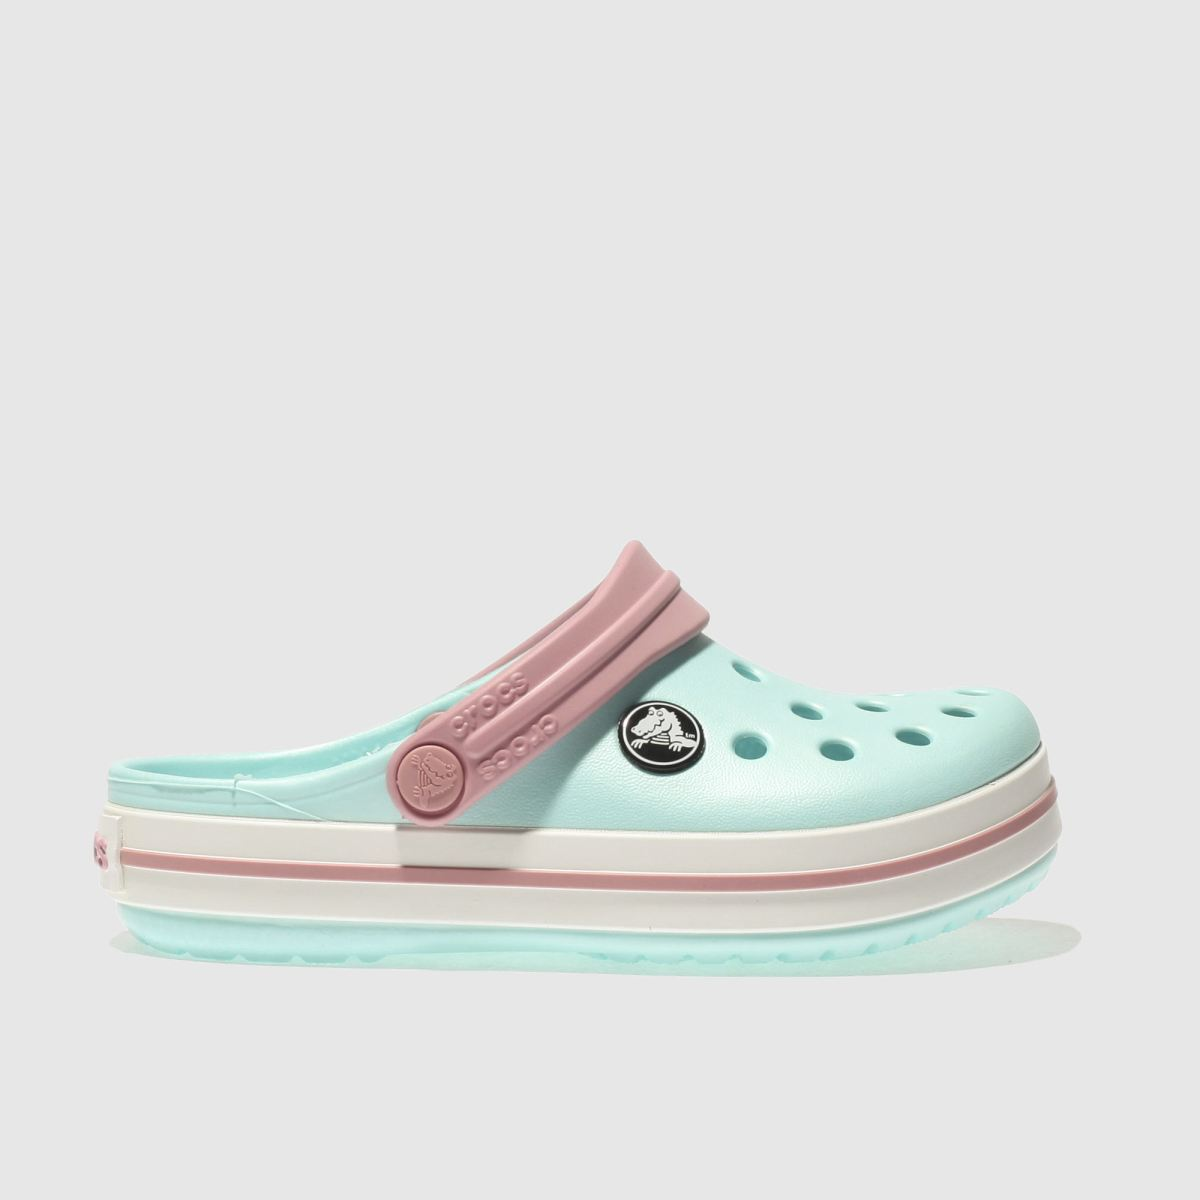 Crocs Pale Blue Crocband Clog Sandals Junior